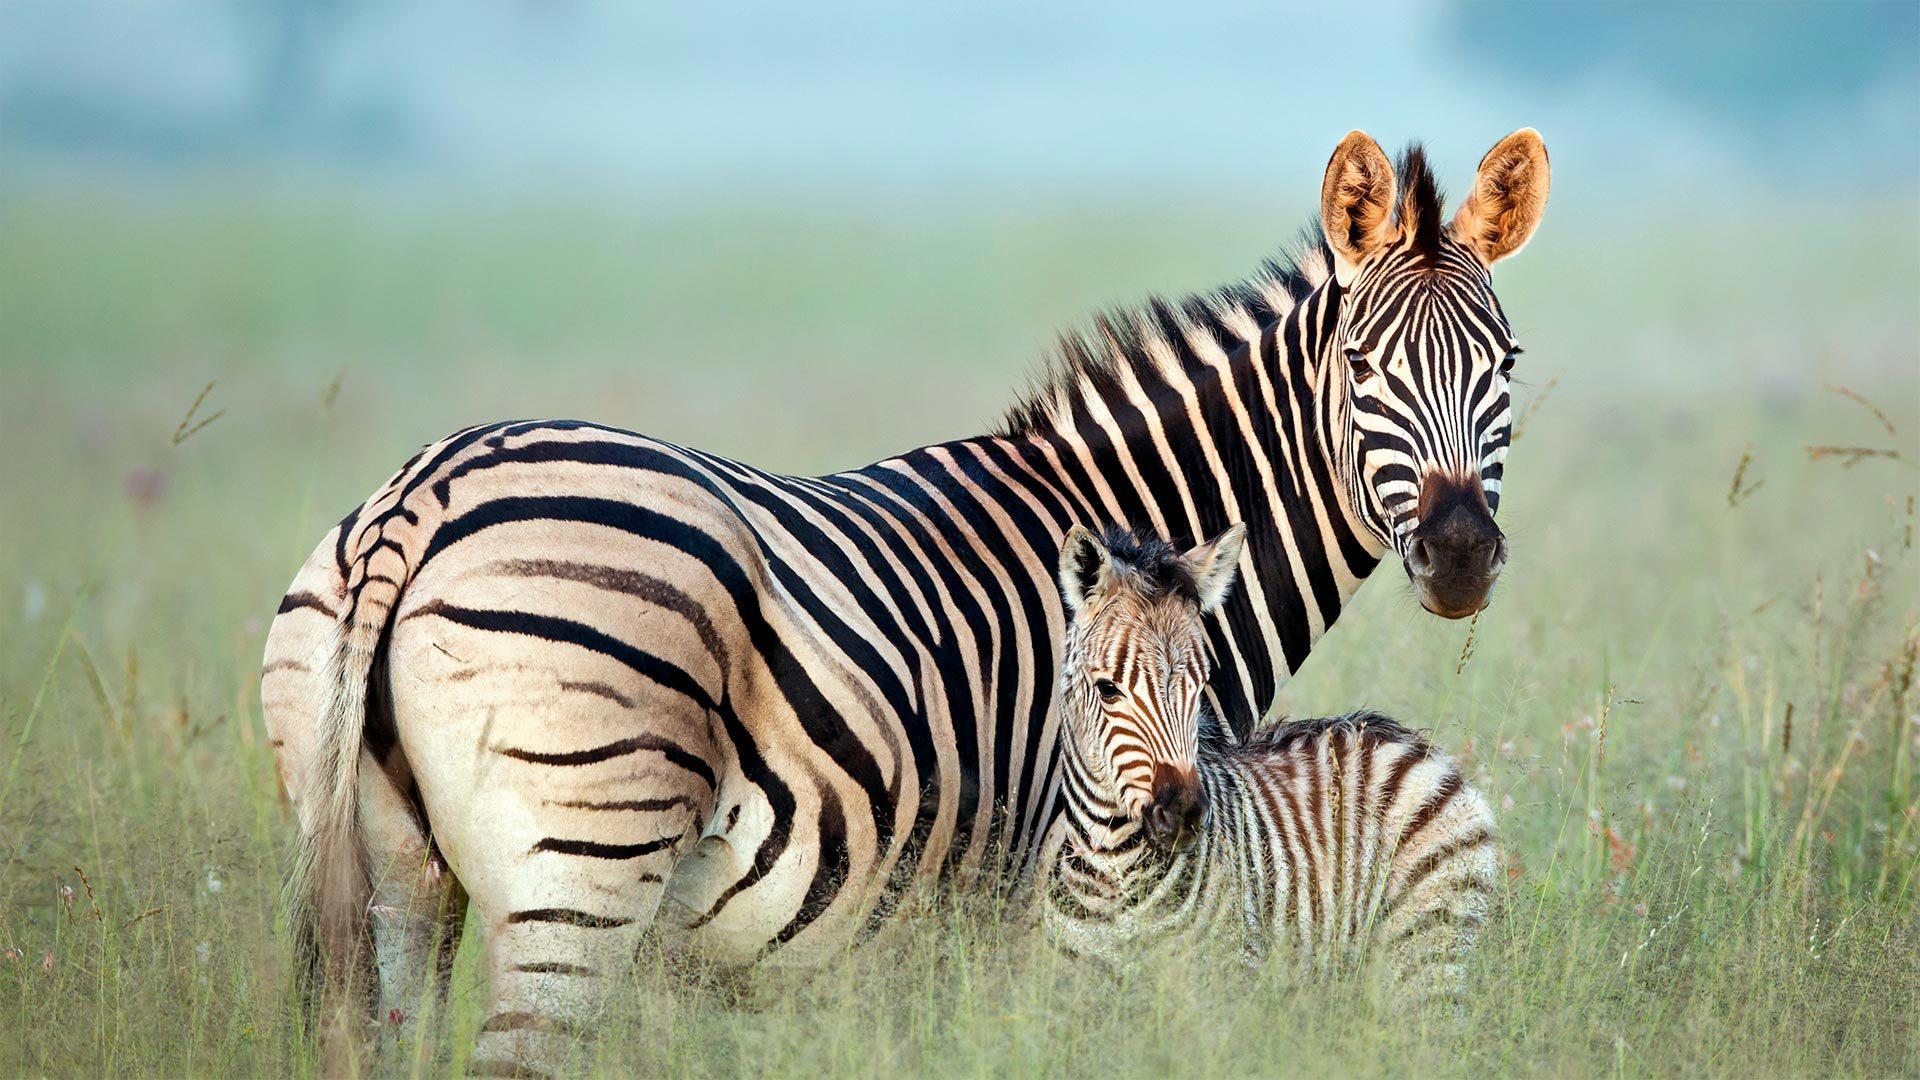 Rietvlei自然保护区内的布氏斑马母子布氏斑马